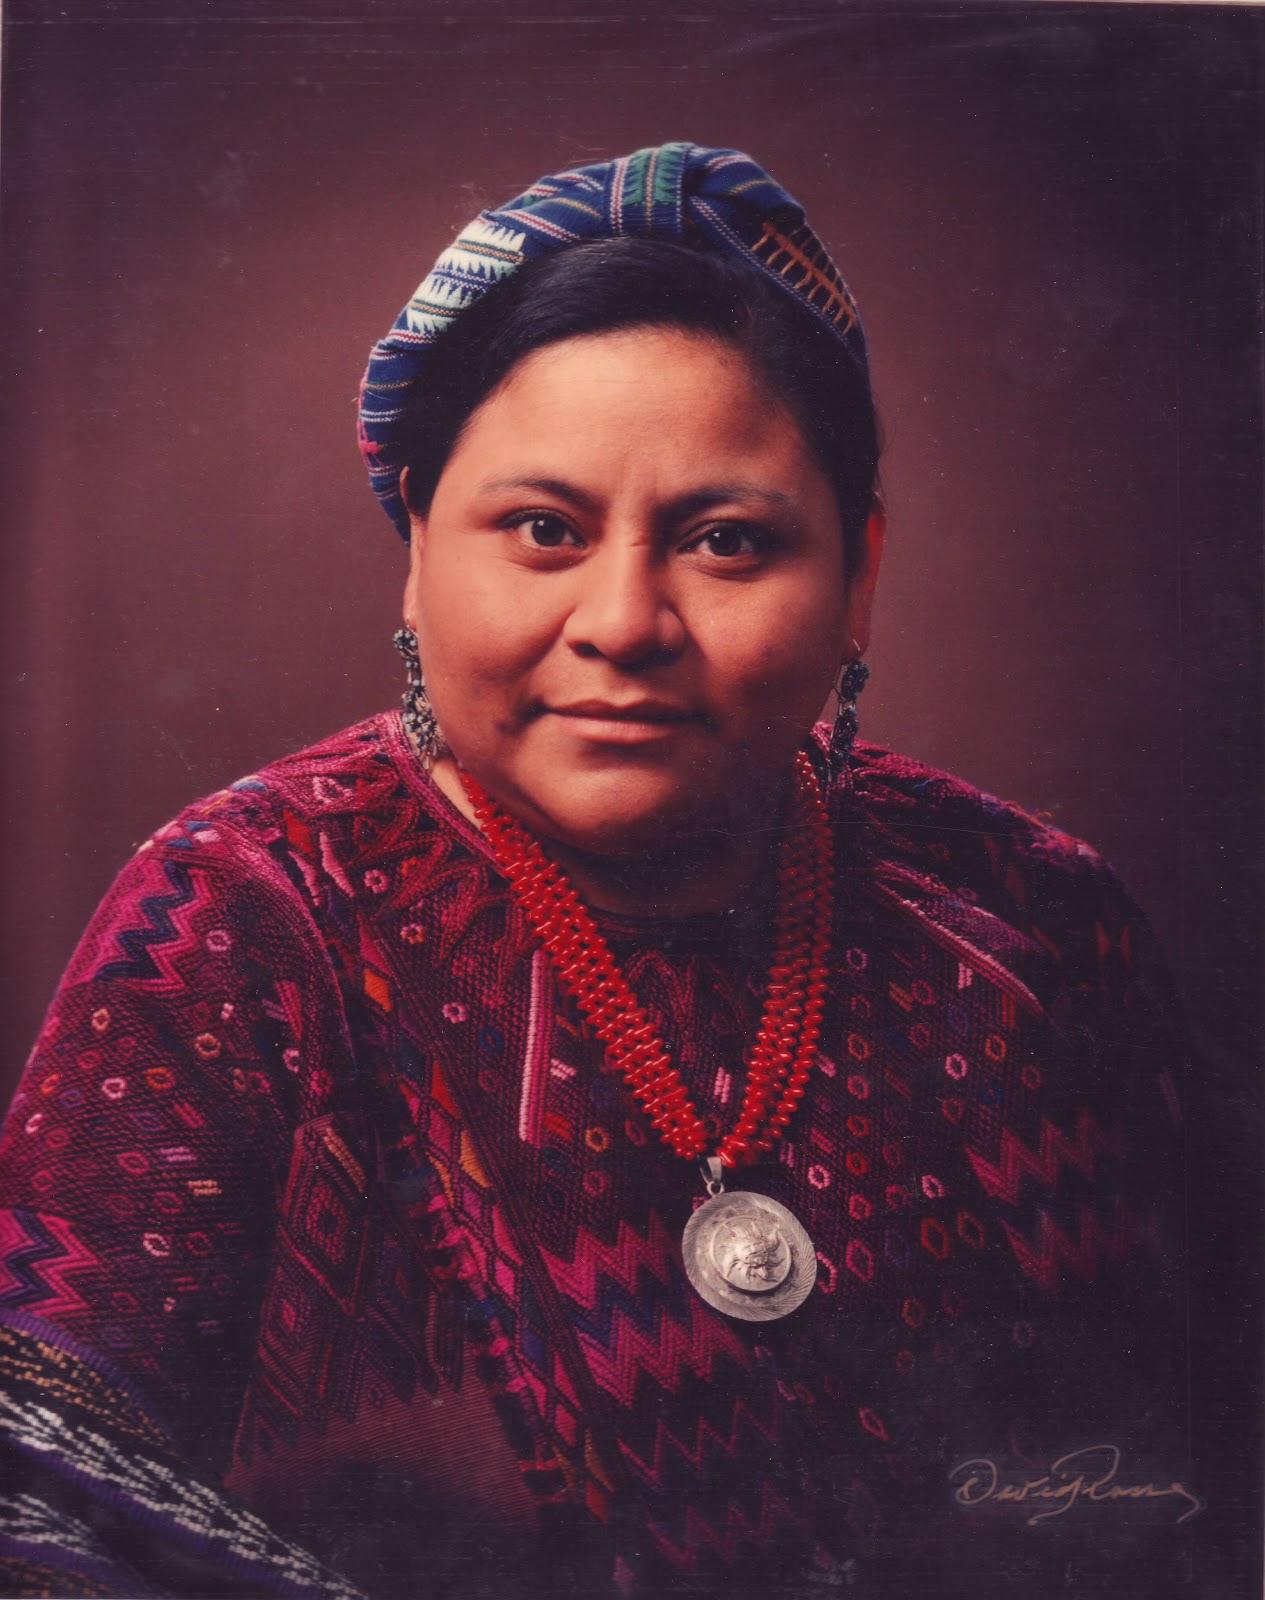 biography of rigoberta menchu essay Rigoberta menchú tum (born 9 january 1959) is an indigenous guatemalan  woman  she is the winner of the 2011 fourth genre michael steinberg essay  prize.